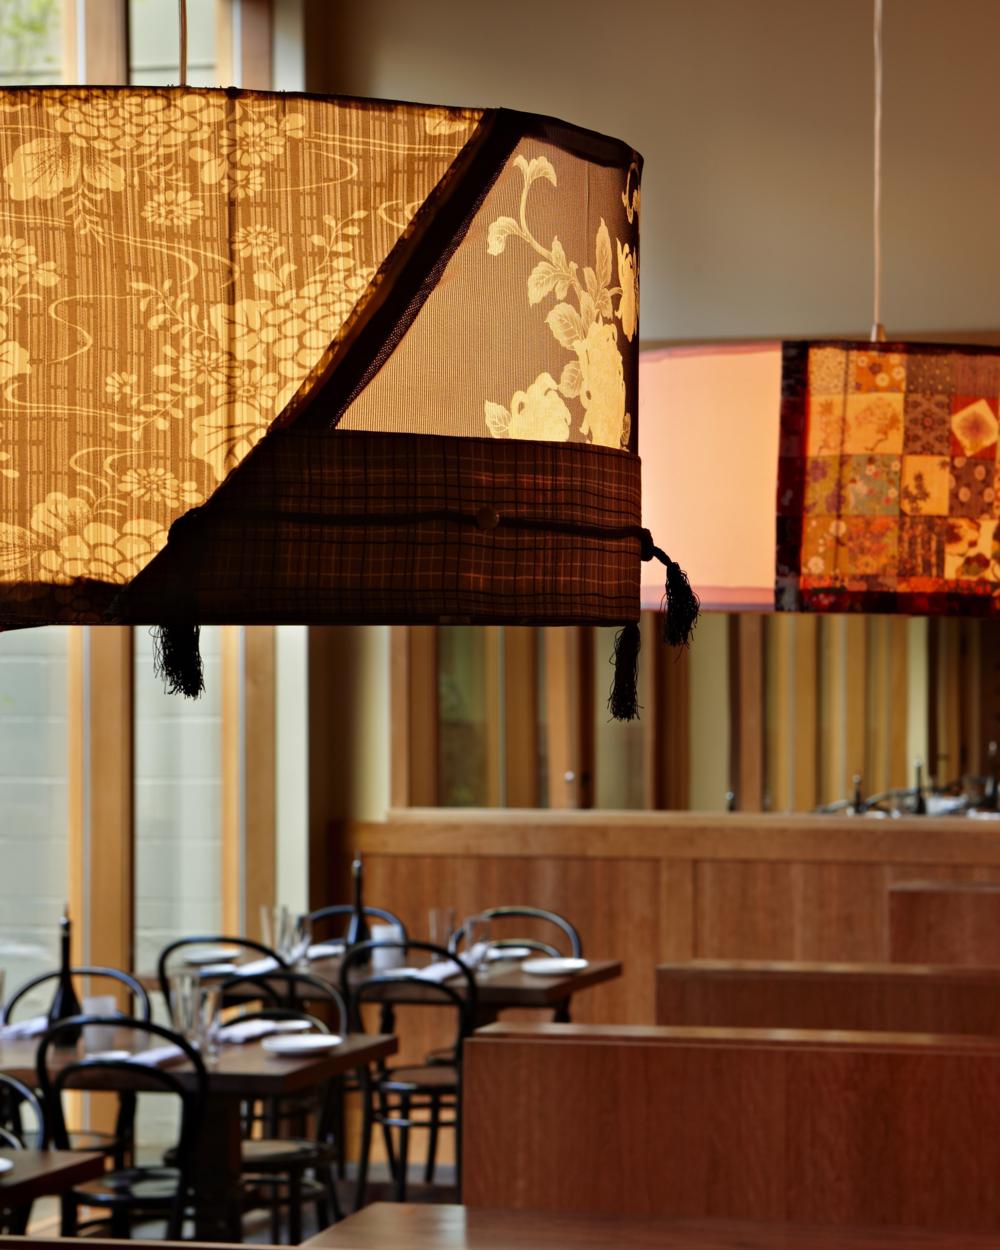 Kimono Lamp (Momiji) Photo byBenjamin Benschneider